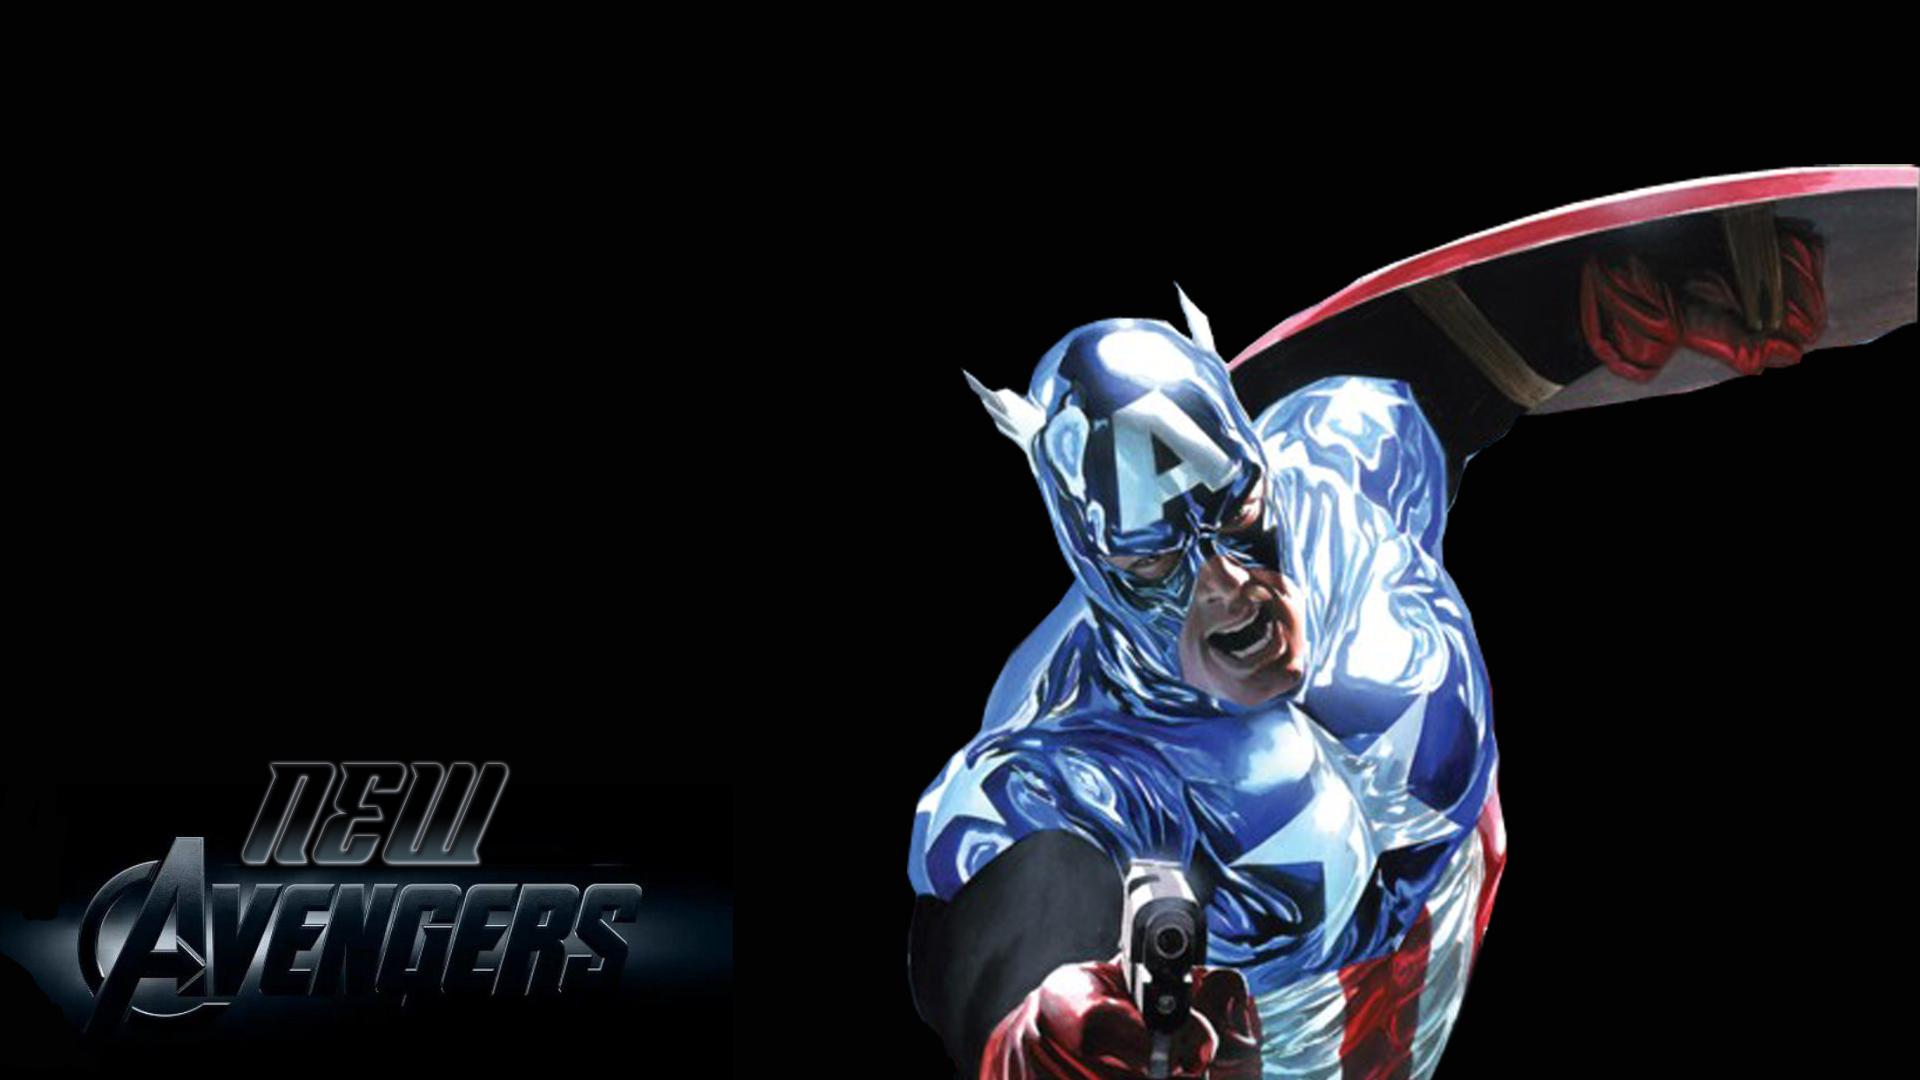 Captain America HD Wallpaper FullHDWpp   Full HD Wallpapers 1920x1080